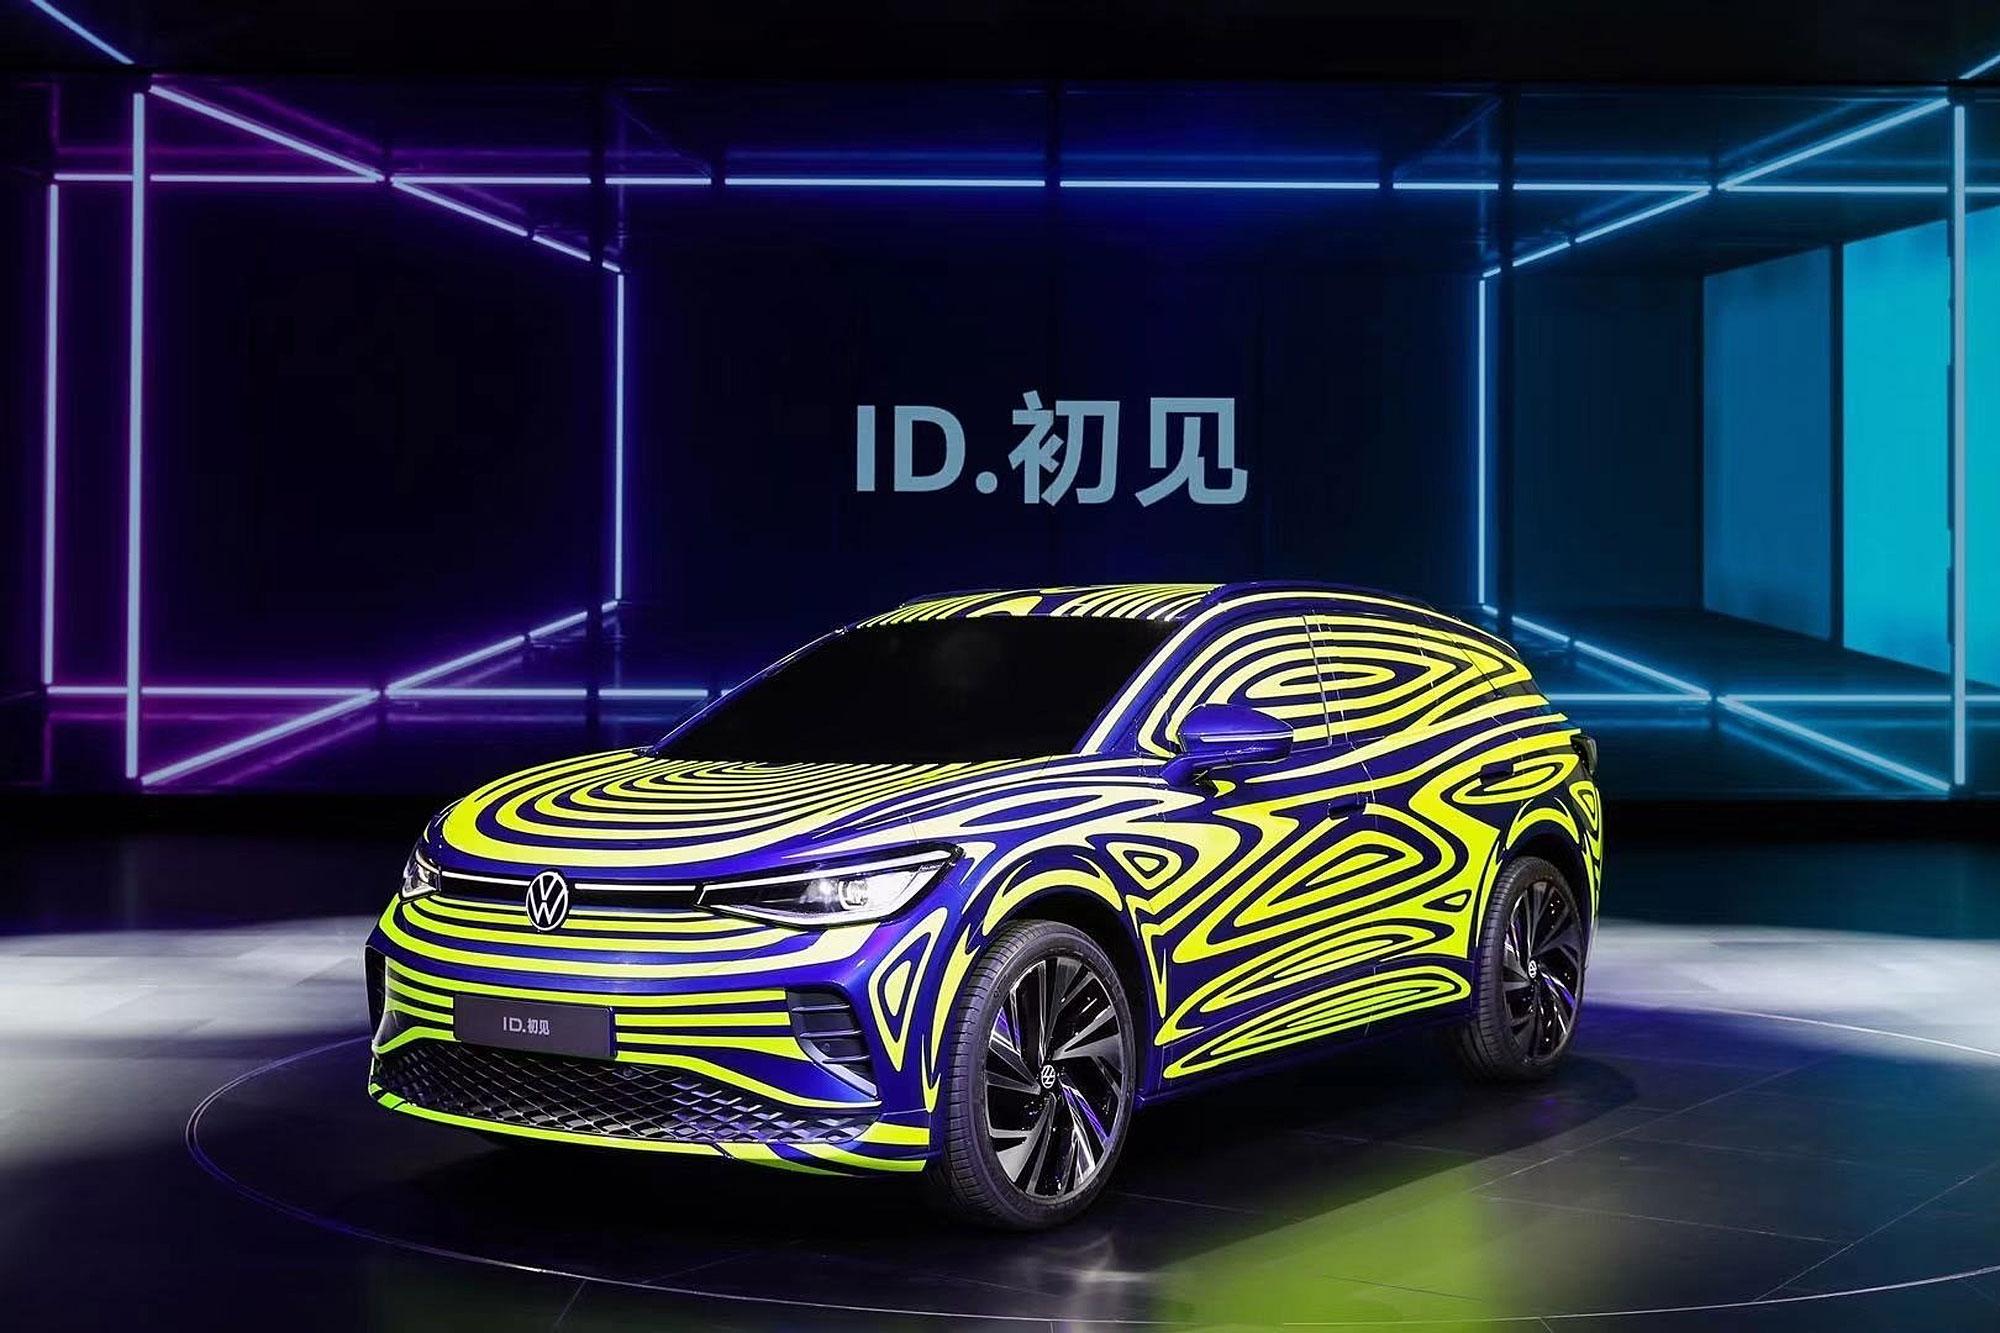 ID. 初見 為專為中國市場打造的電動 SUV 。